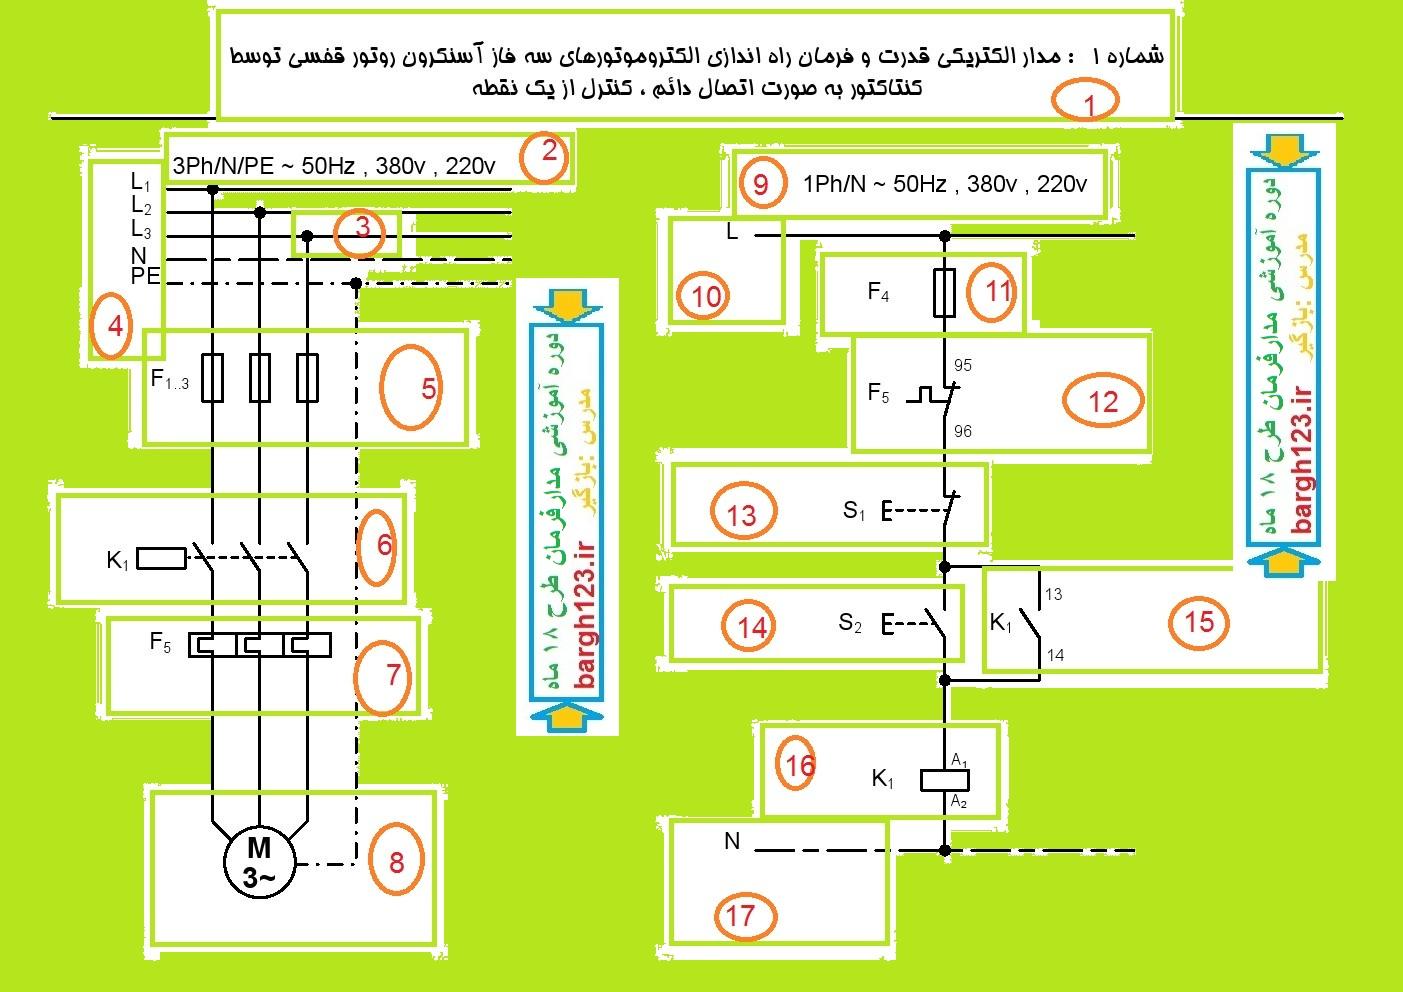 مدار فرمان وقدرت برق صنعتی